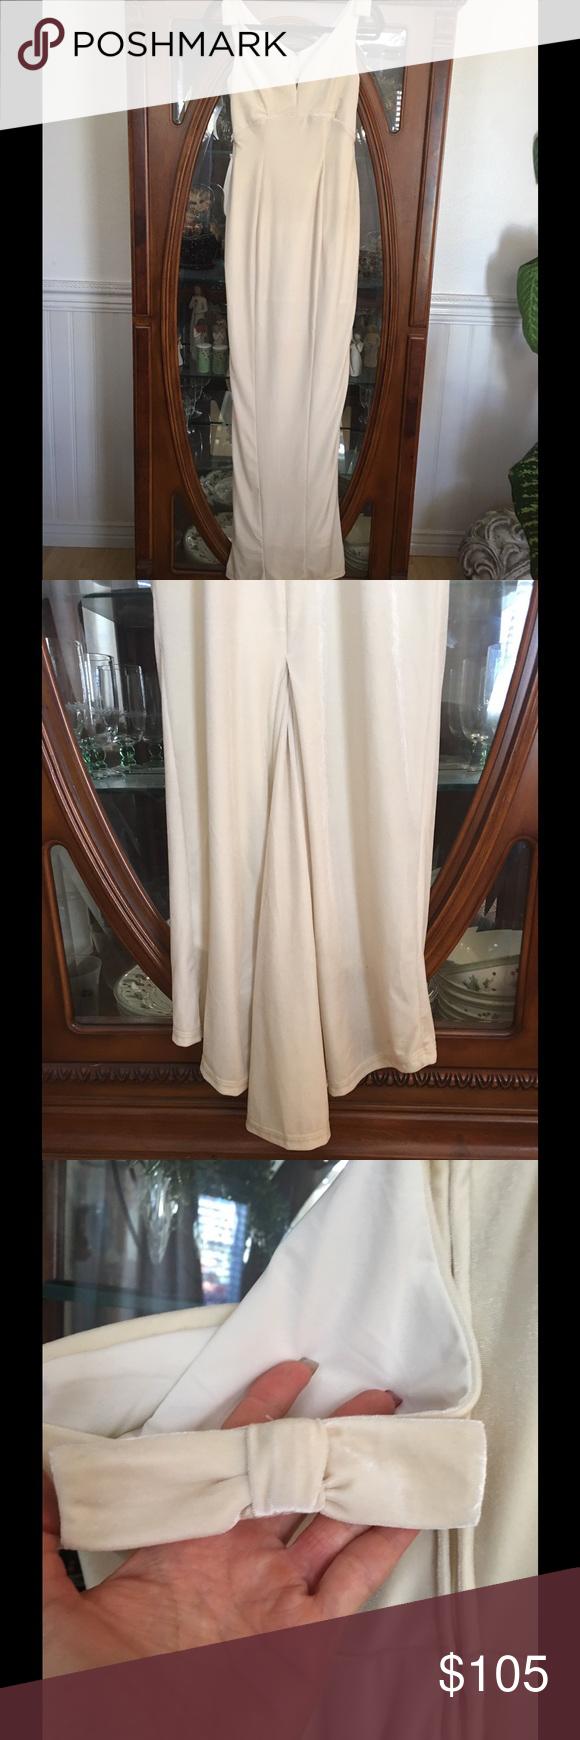 Pinup girl velvet dress never worn shoulder and customer support